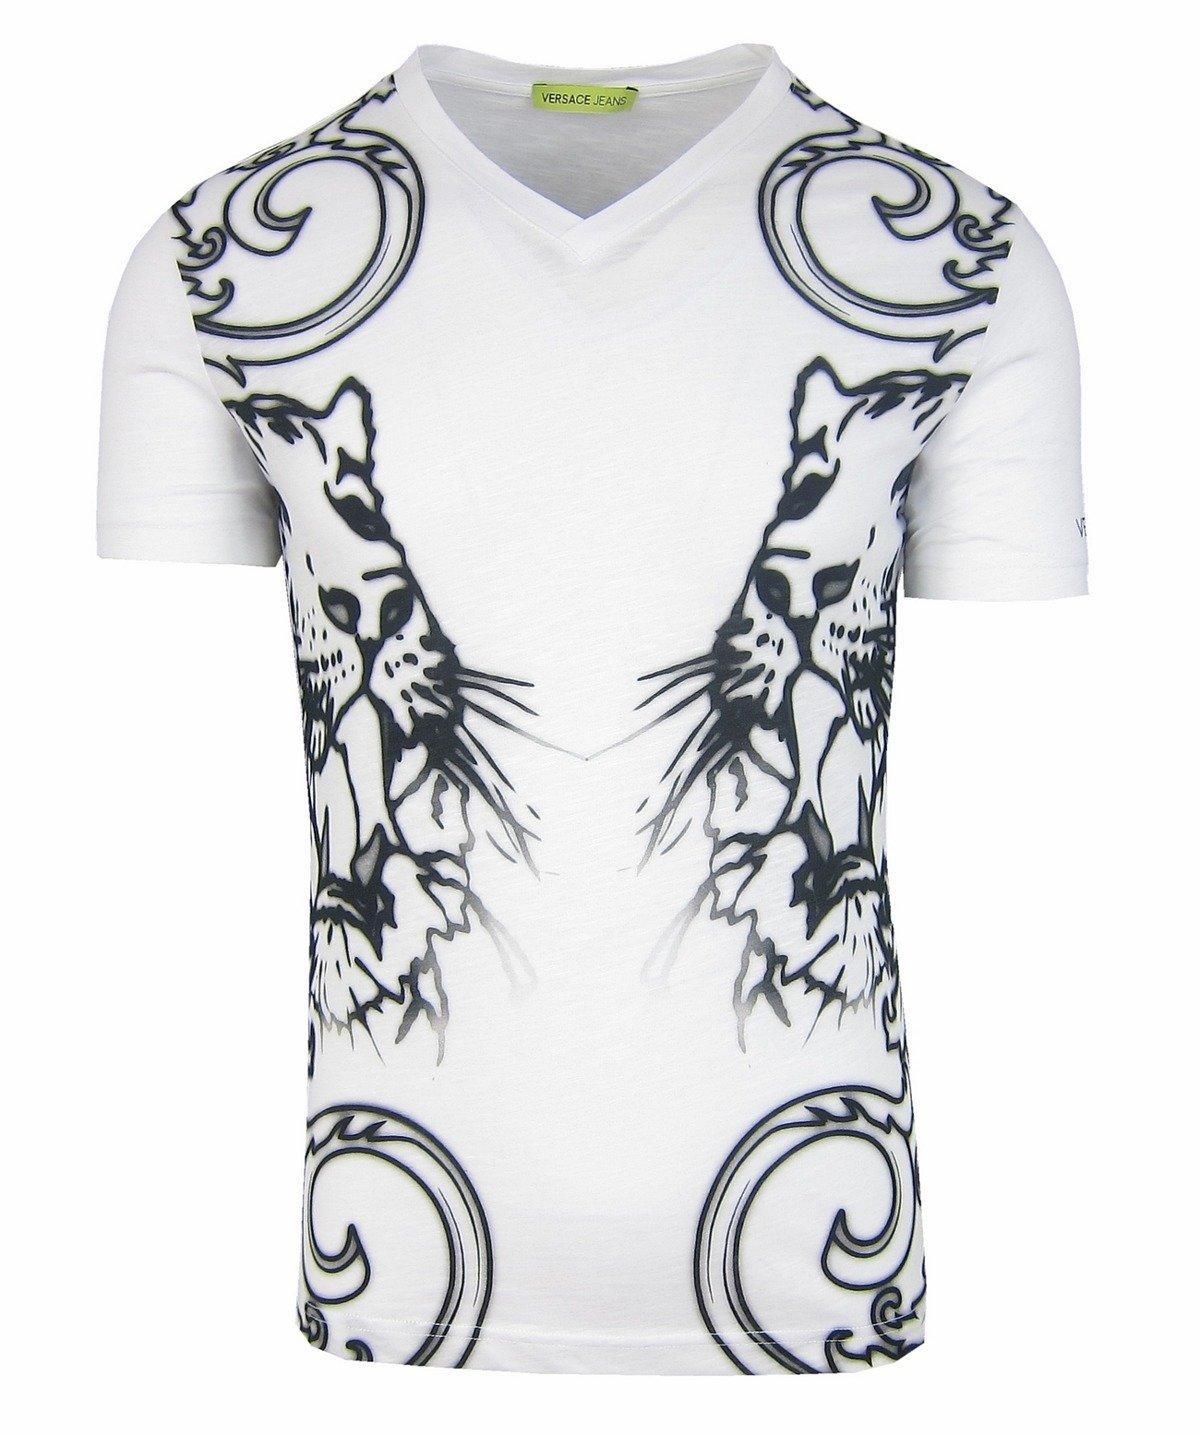 0417ca7d25f944 VERSACE JEANS B3GNA782 Herren Men T-Shirt Kurzarm Weiß White Tiger Motiv  Click to zoom ...